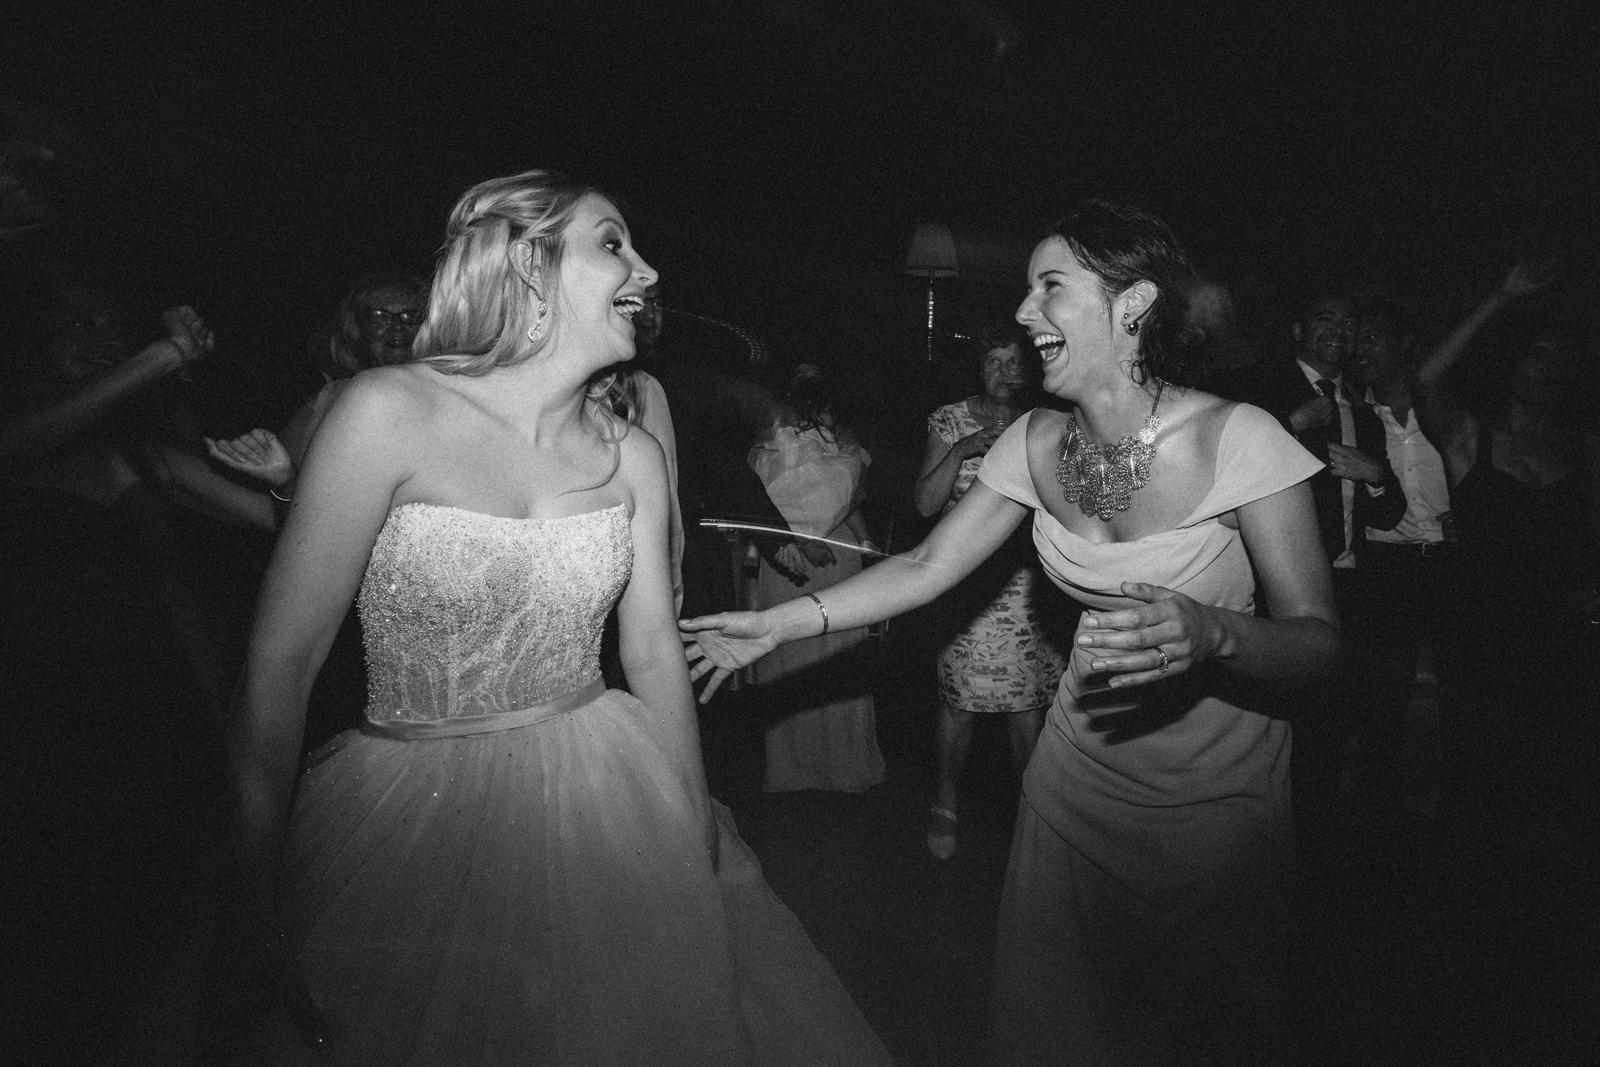 NYC Wedding Photography Sofitel Central Park Brooklyn Photographer Boris Zaretsky _B2C3170.jpg